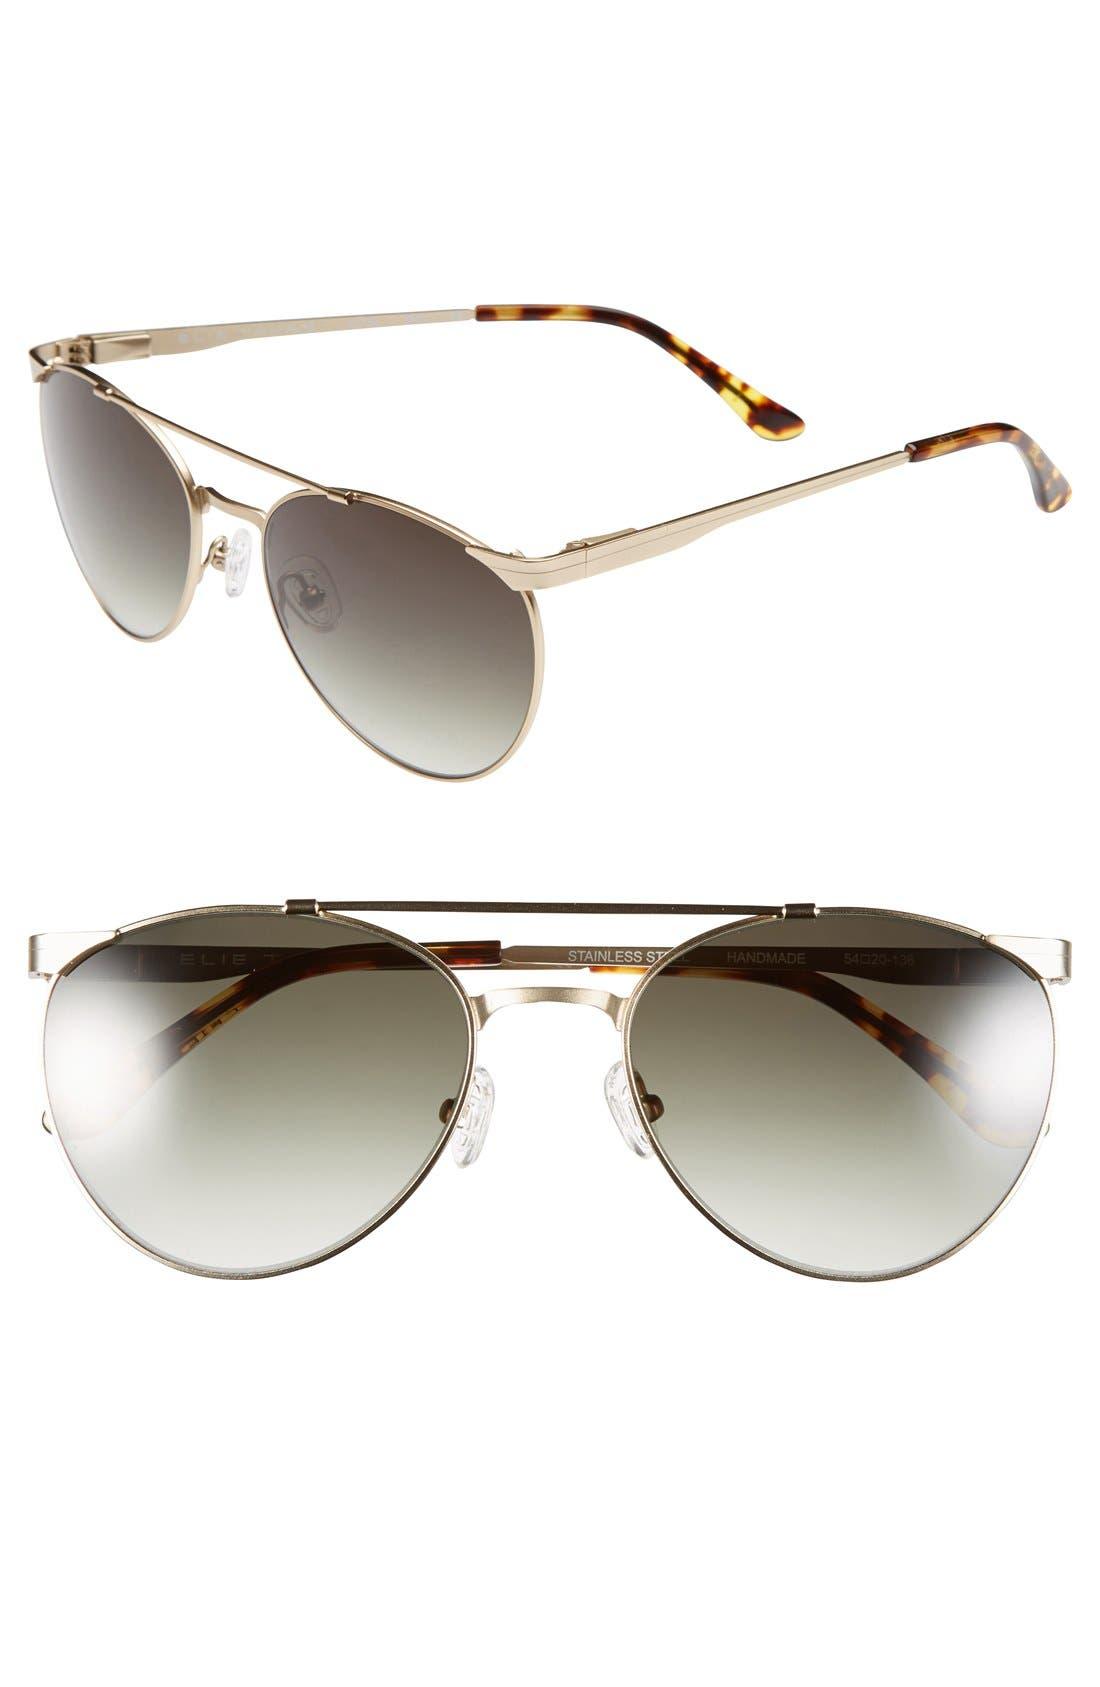 Main Image - Elie Tahari 54mm Aviator Sunglasses